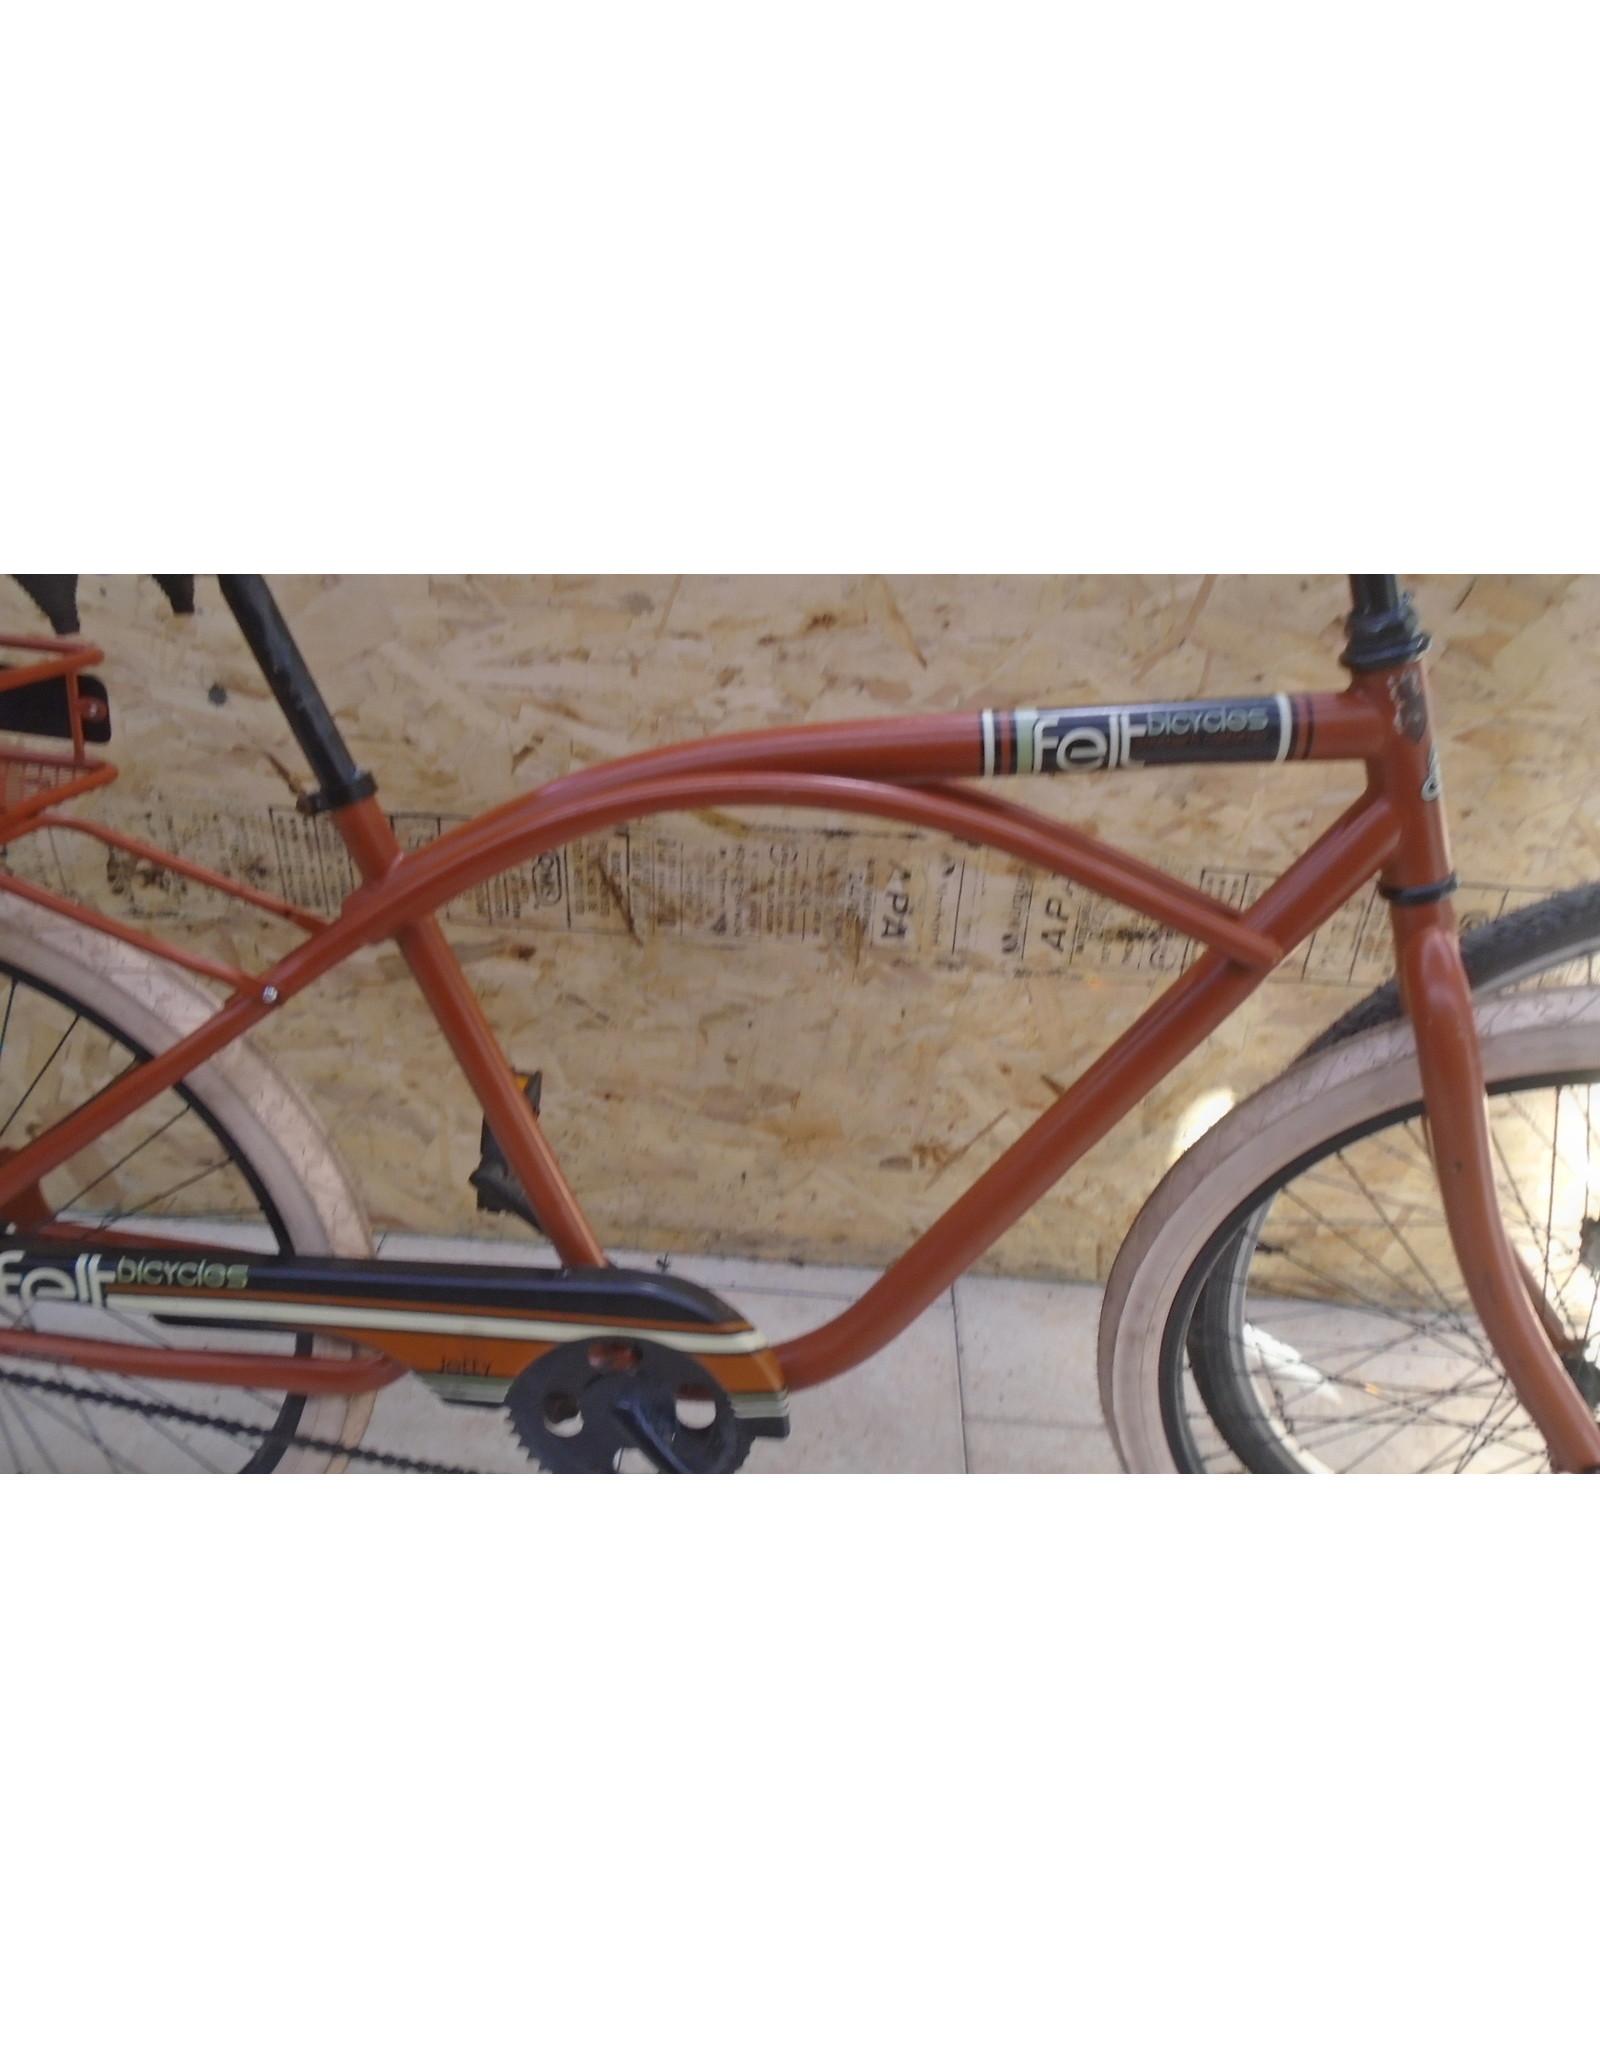 "Vélo usagé de ville Felt Jetty 18"" - 10095"